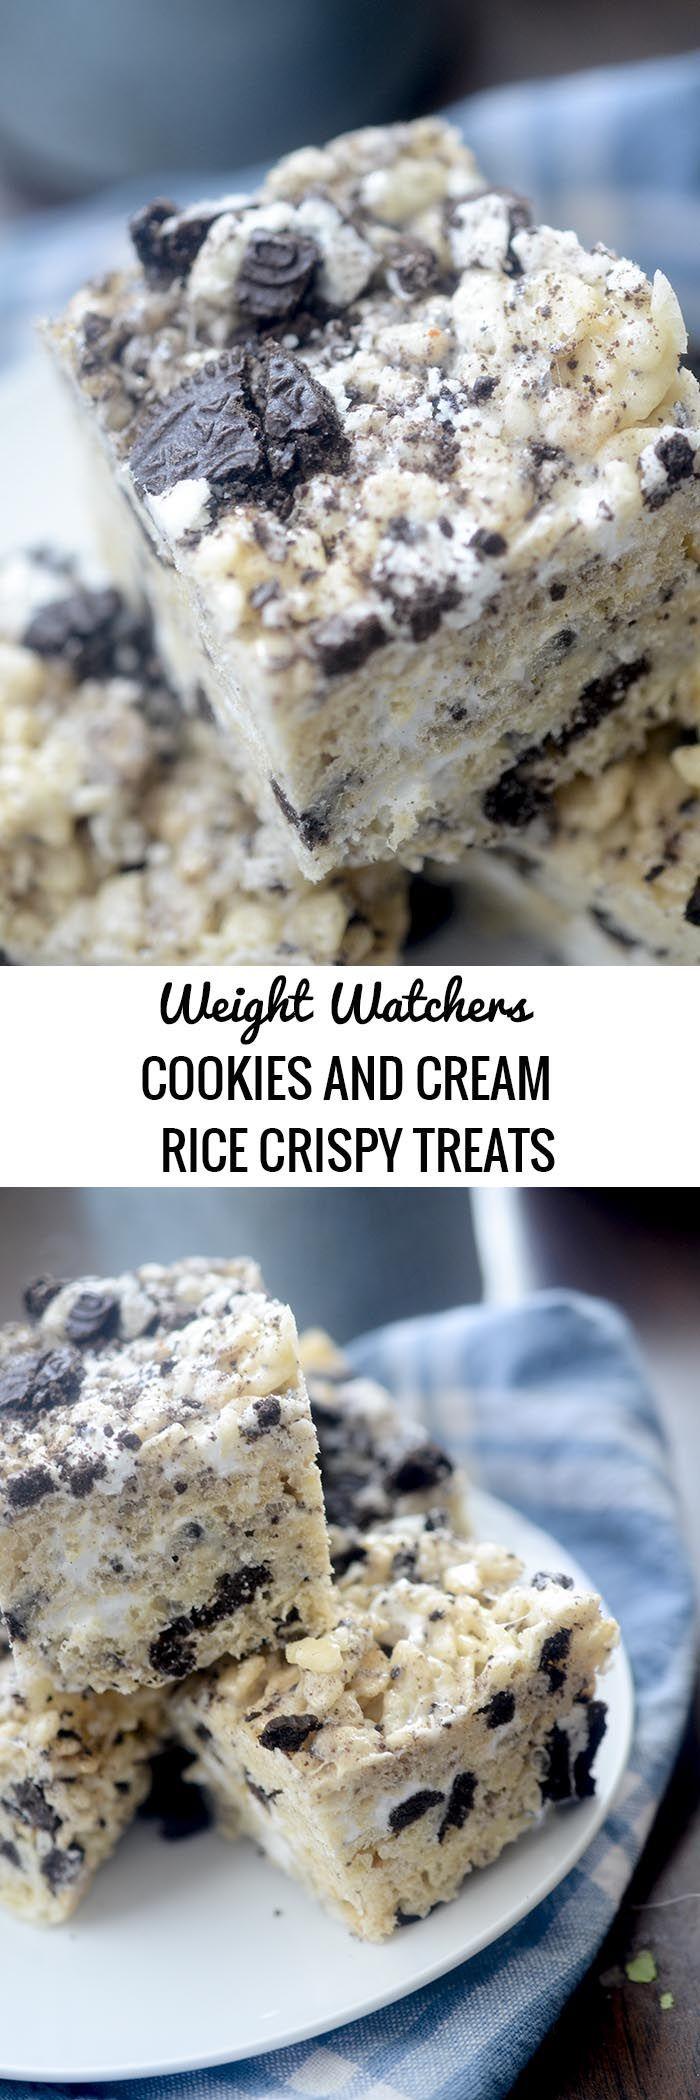 Cookies and Cream Rice Krispy Treats #crispytreats